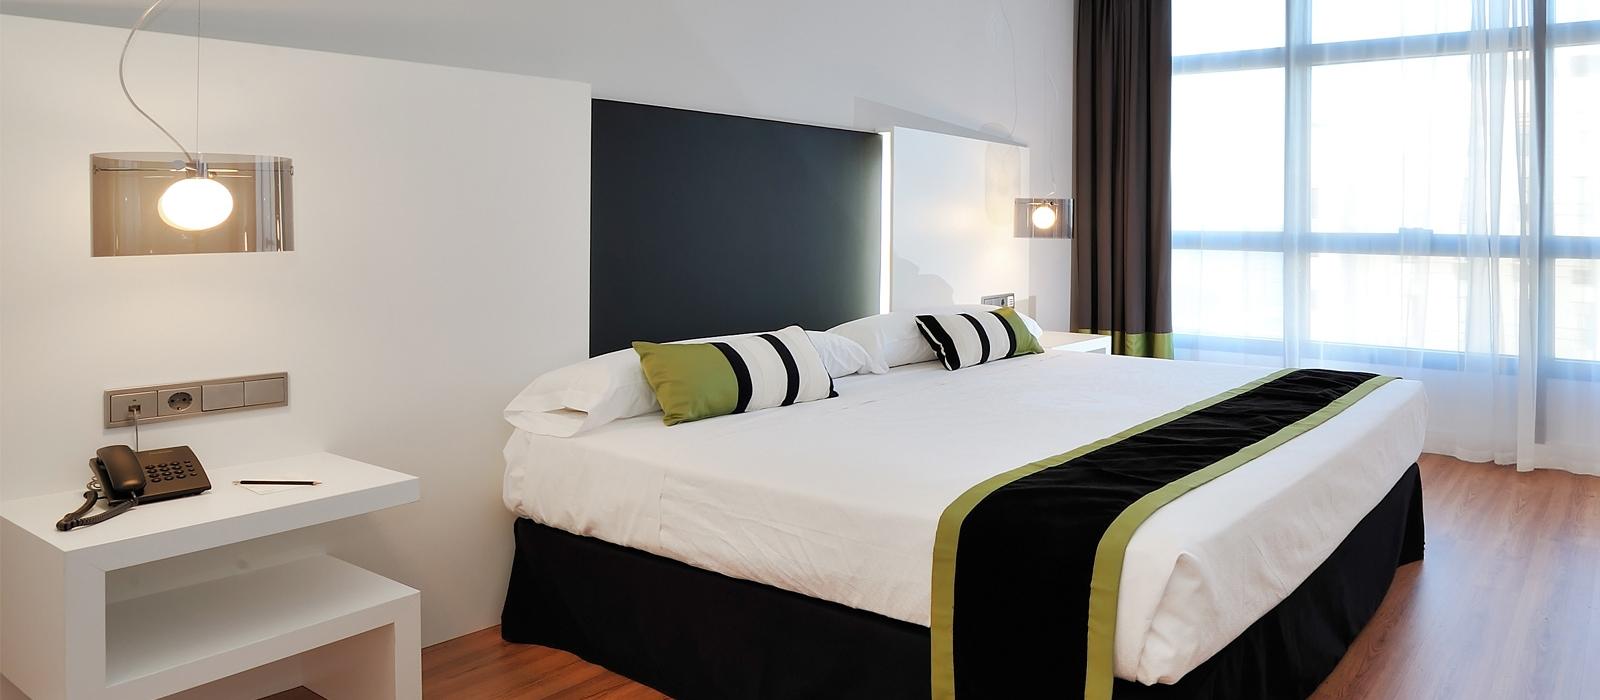 Standard-Twin-/Doppelzimmer | Vinnci Málaga 4*